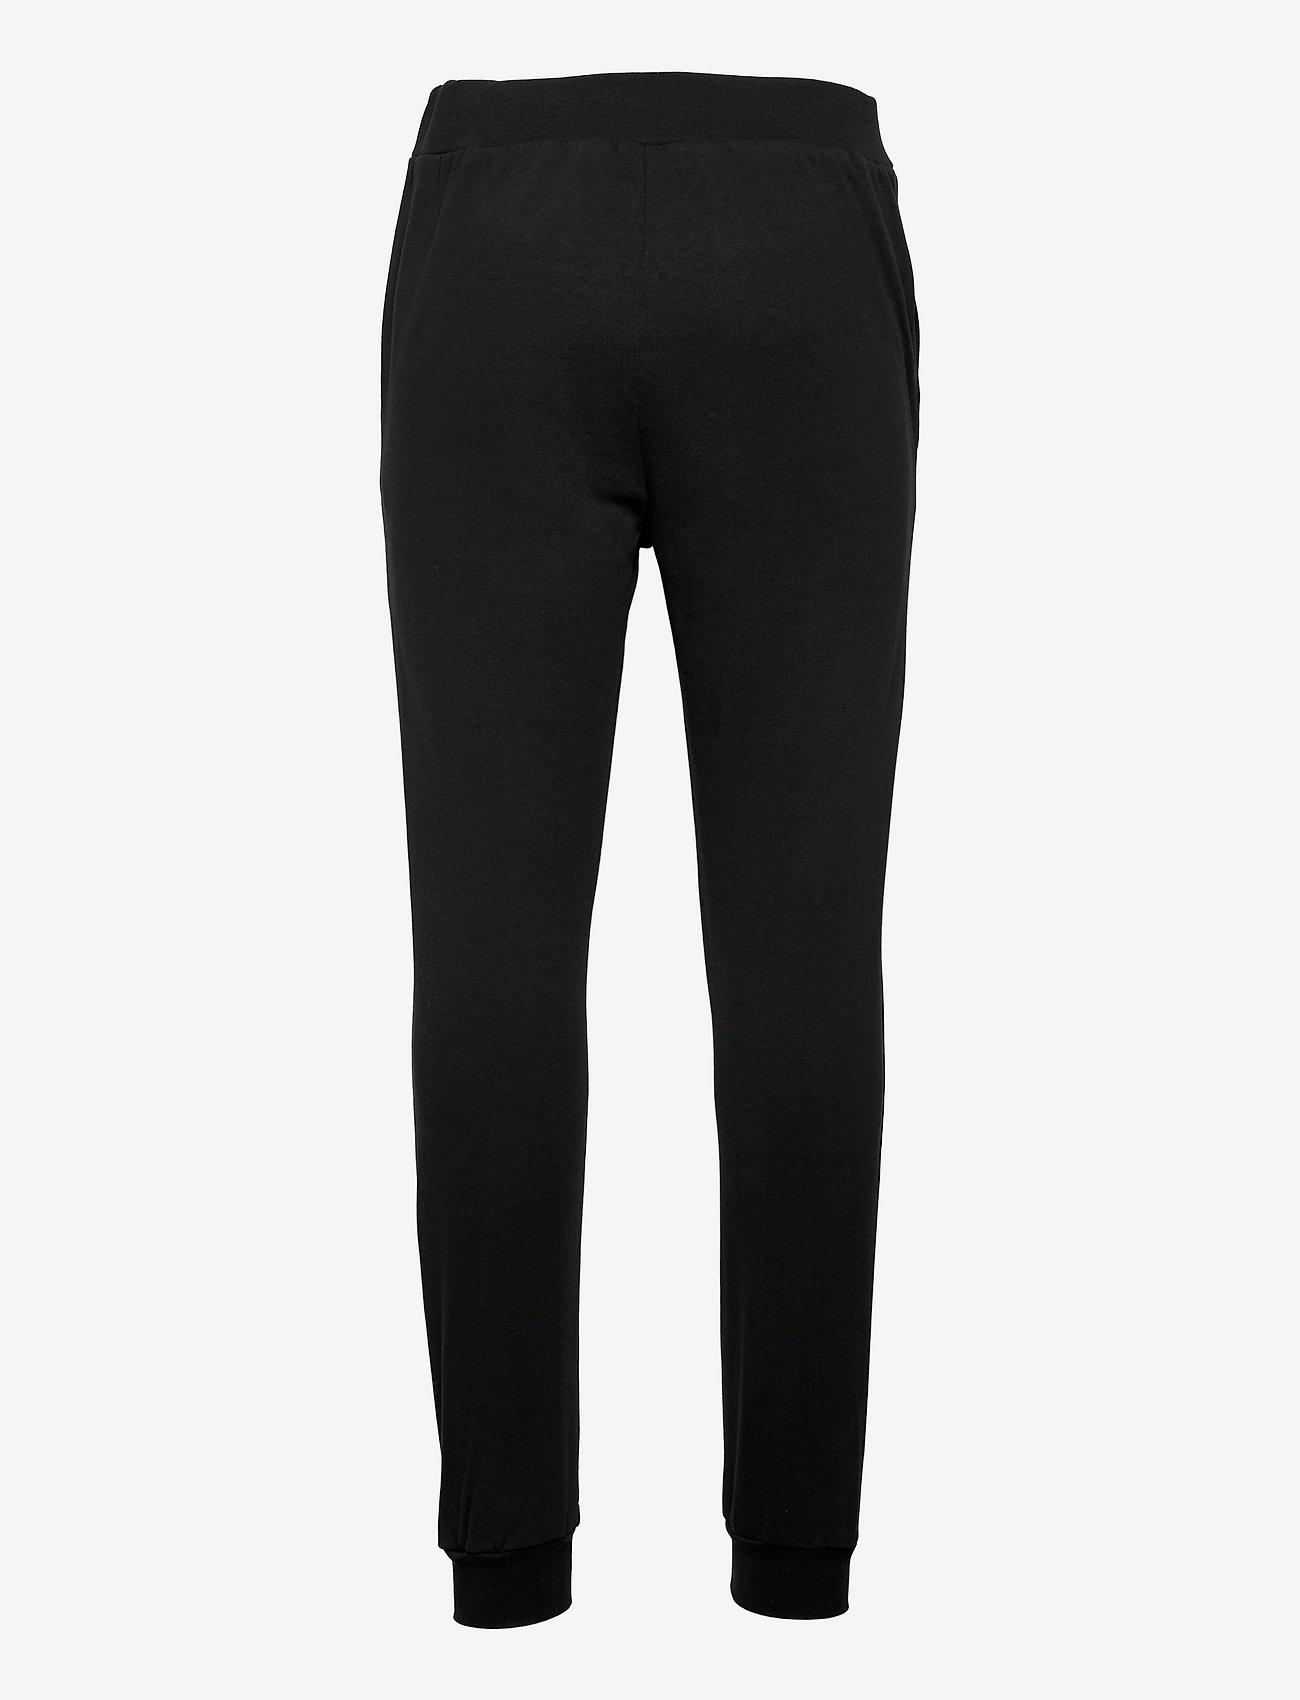 Knowledge Cotton Apparel - TEAK sweat pants - GOTS/Vegan - kleding - black jet - 1